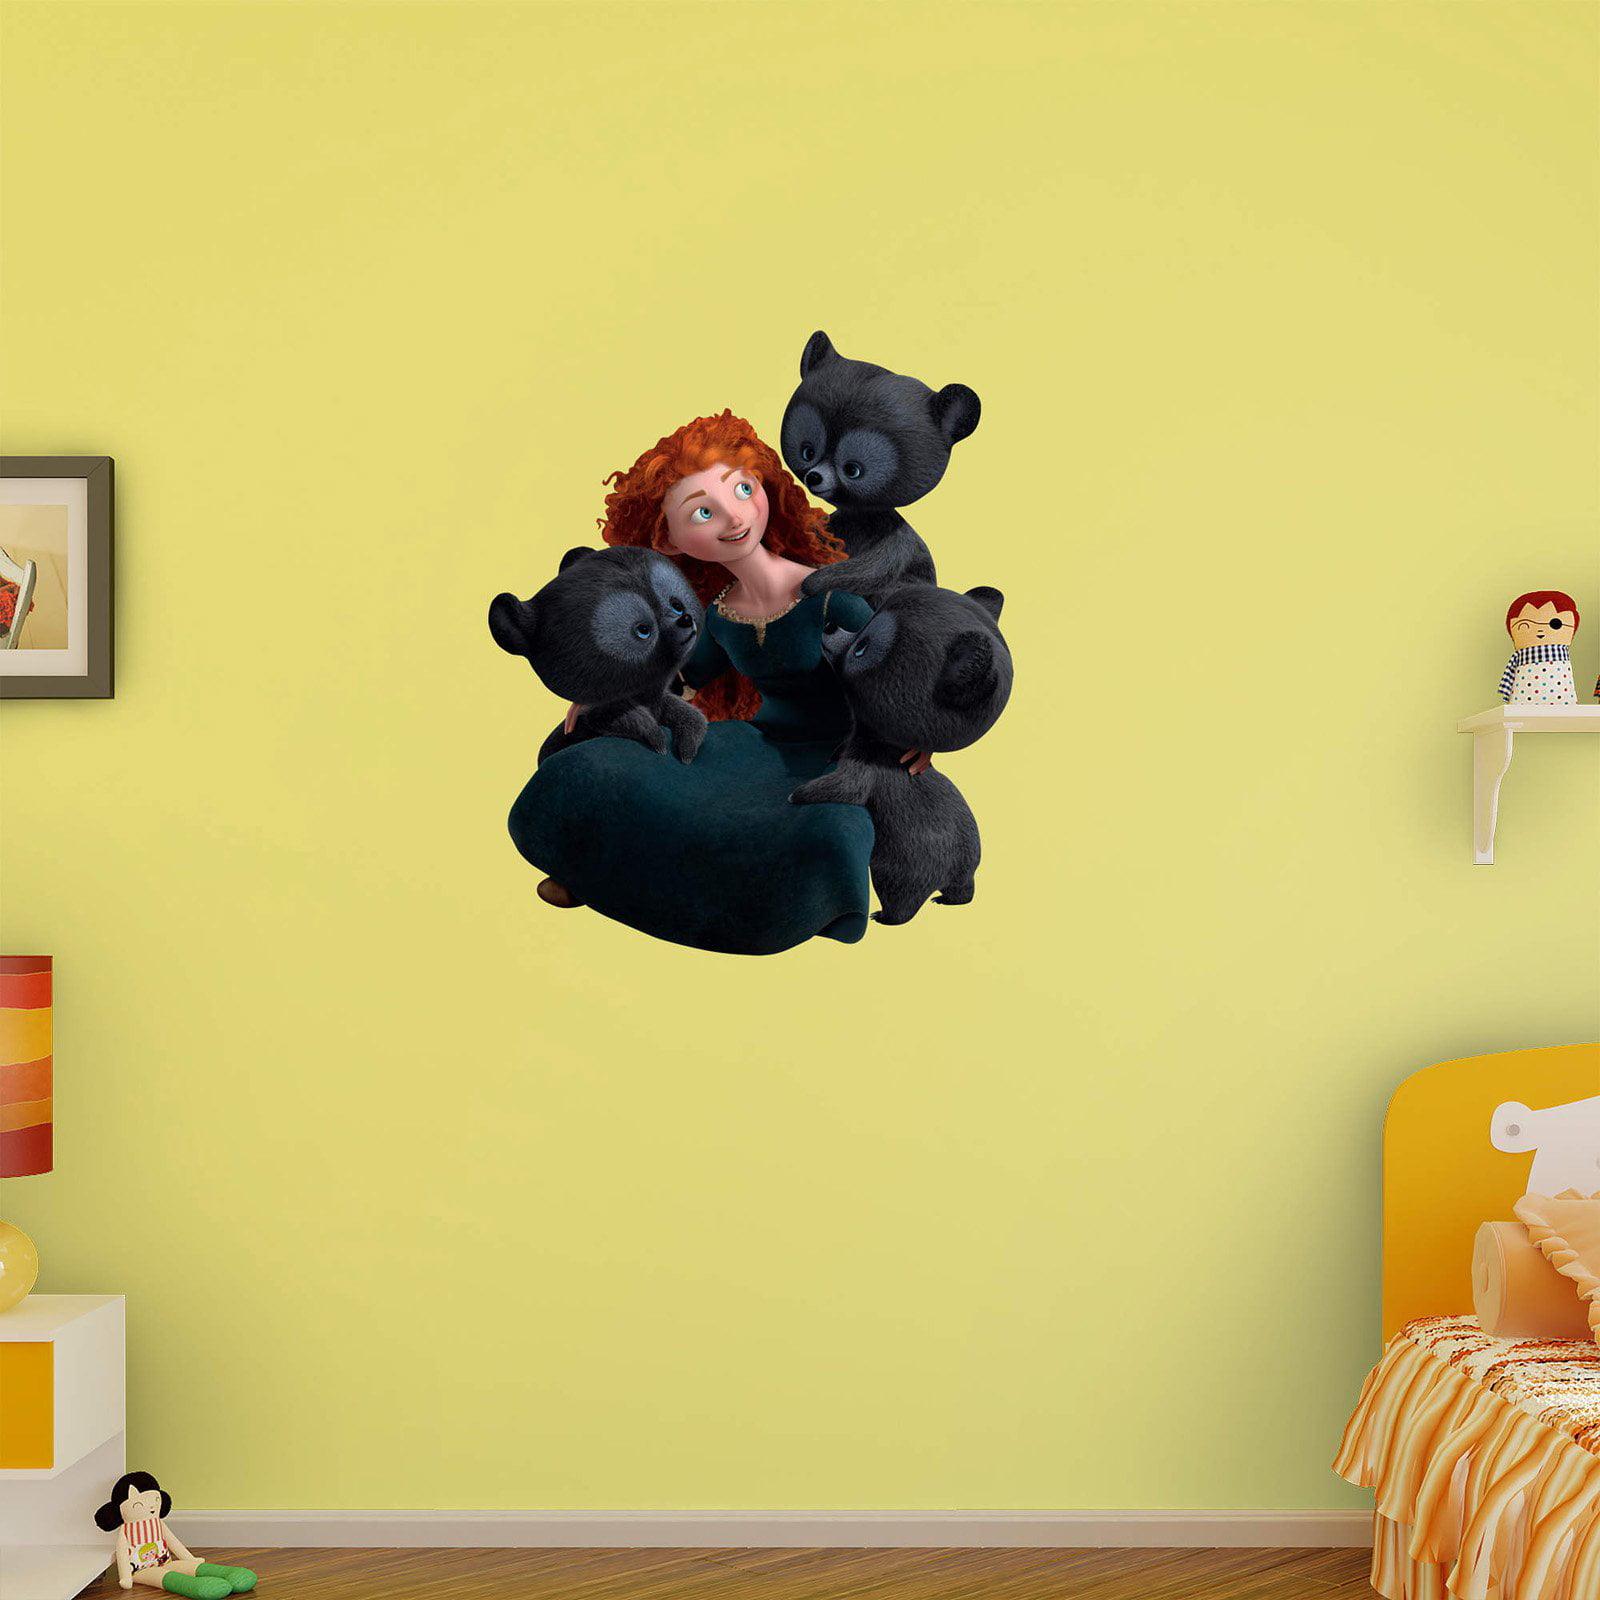 Fathead Brave Merida Cubs Wall Decal - Walmart.com